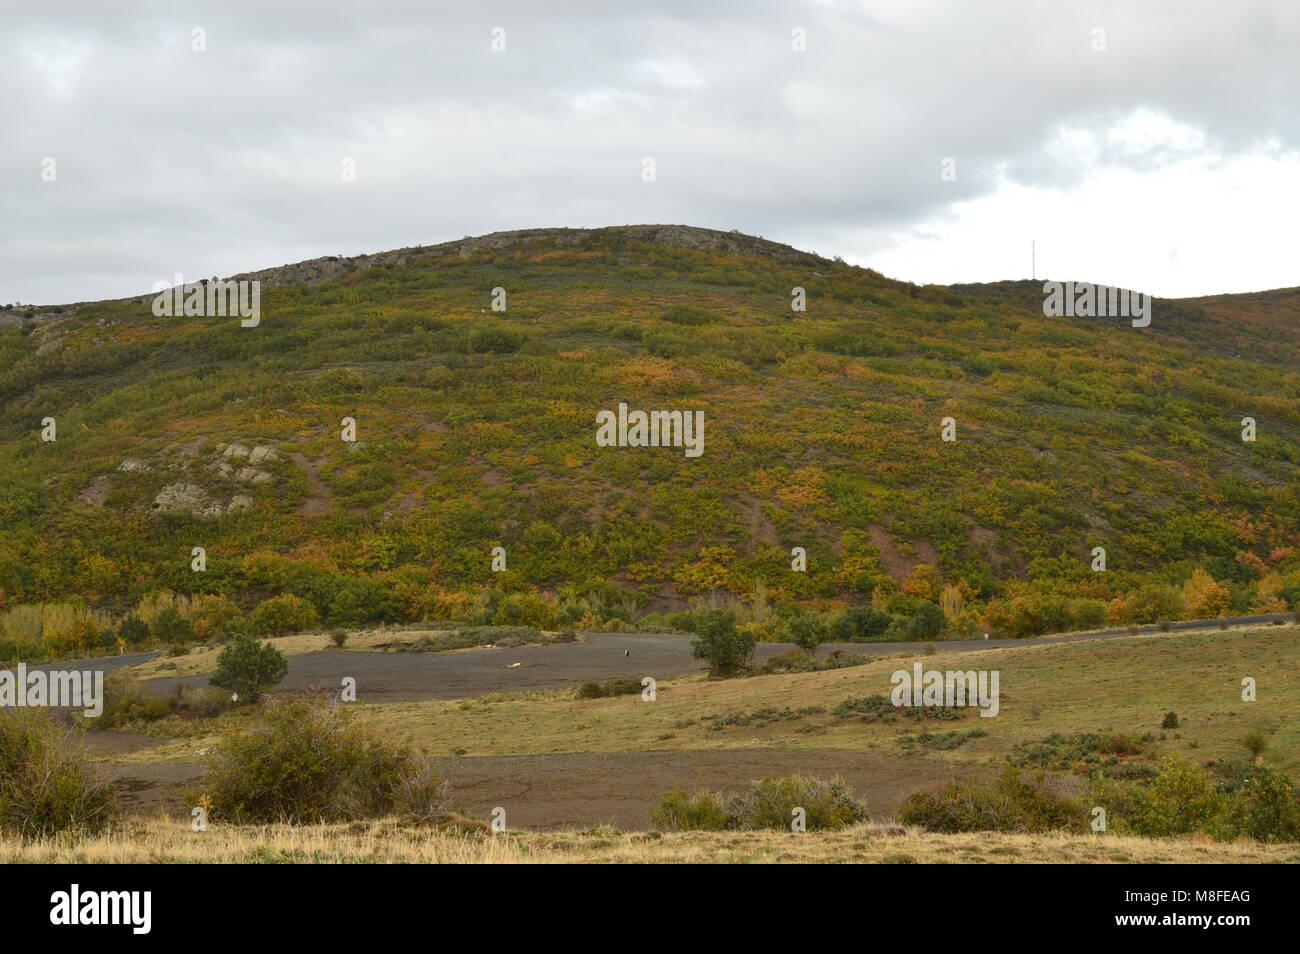 Beautiful Mountain Range And Field Of Segovia. Landscapes Holidays Travel October 21, 2017. Becerril Segovia Castilla Stock Photo